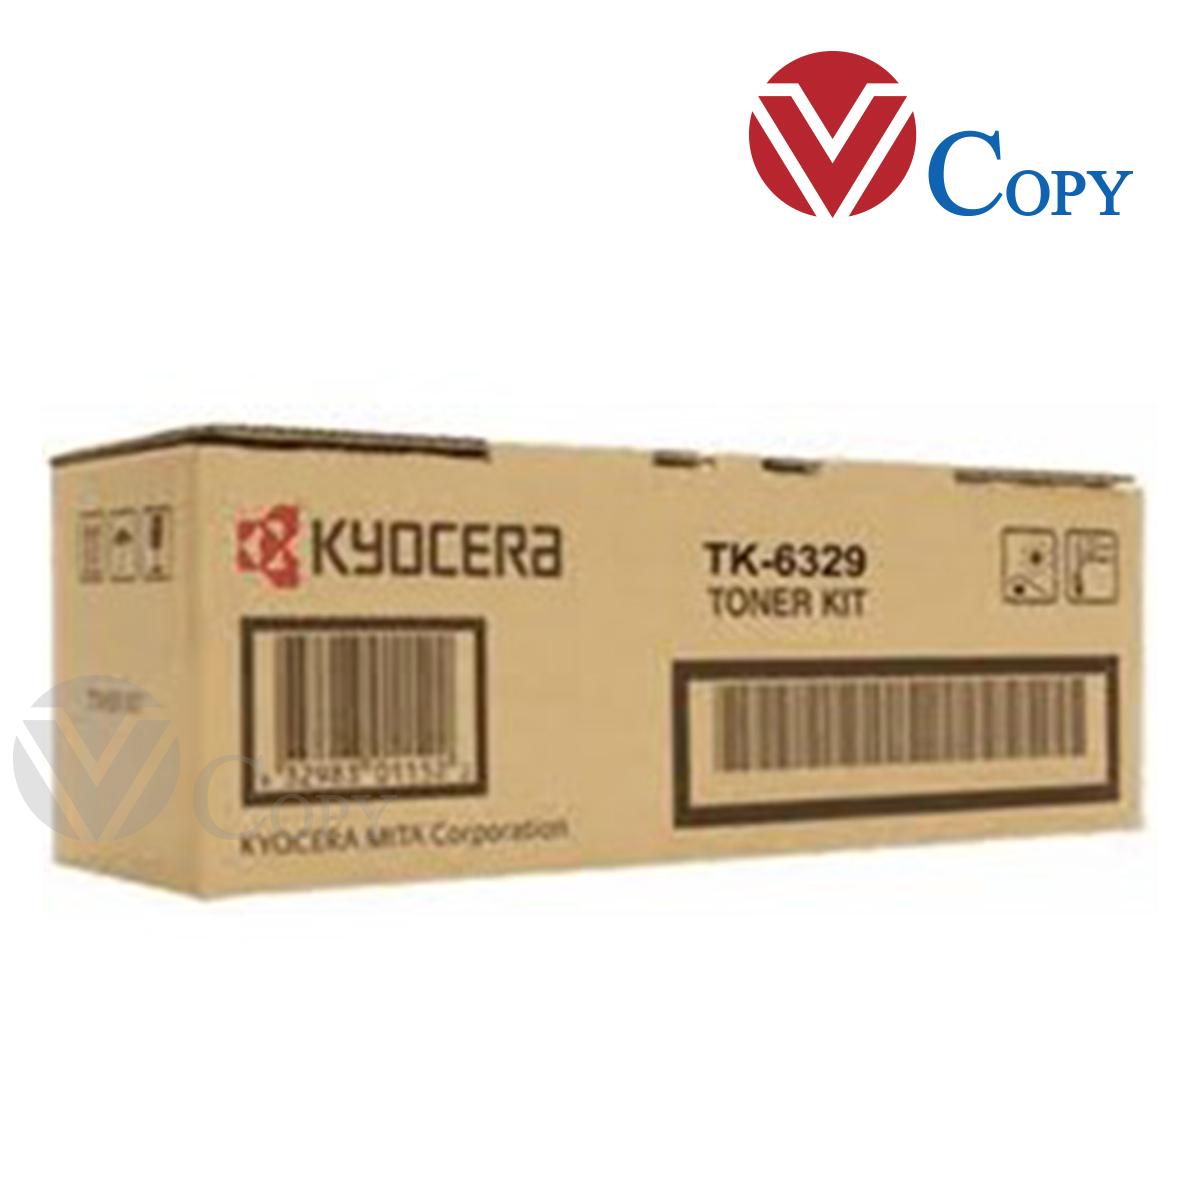 Mực Thương hiệu dùng cho máy Photocopy Kyocera TASKalfa 4002i/ 5002i/ 6002i - Hộp mực TK 6329